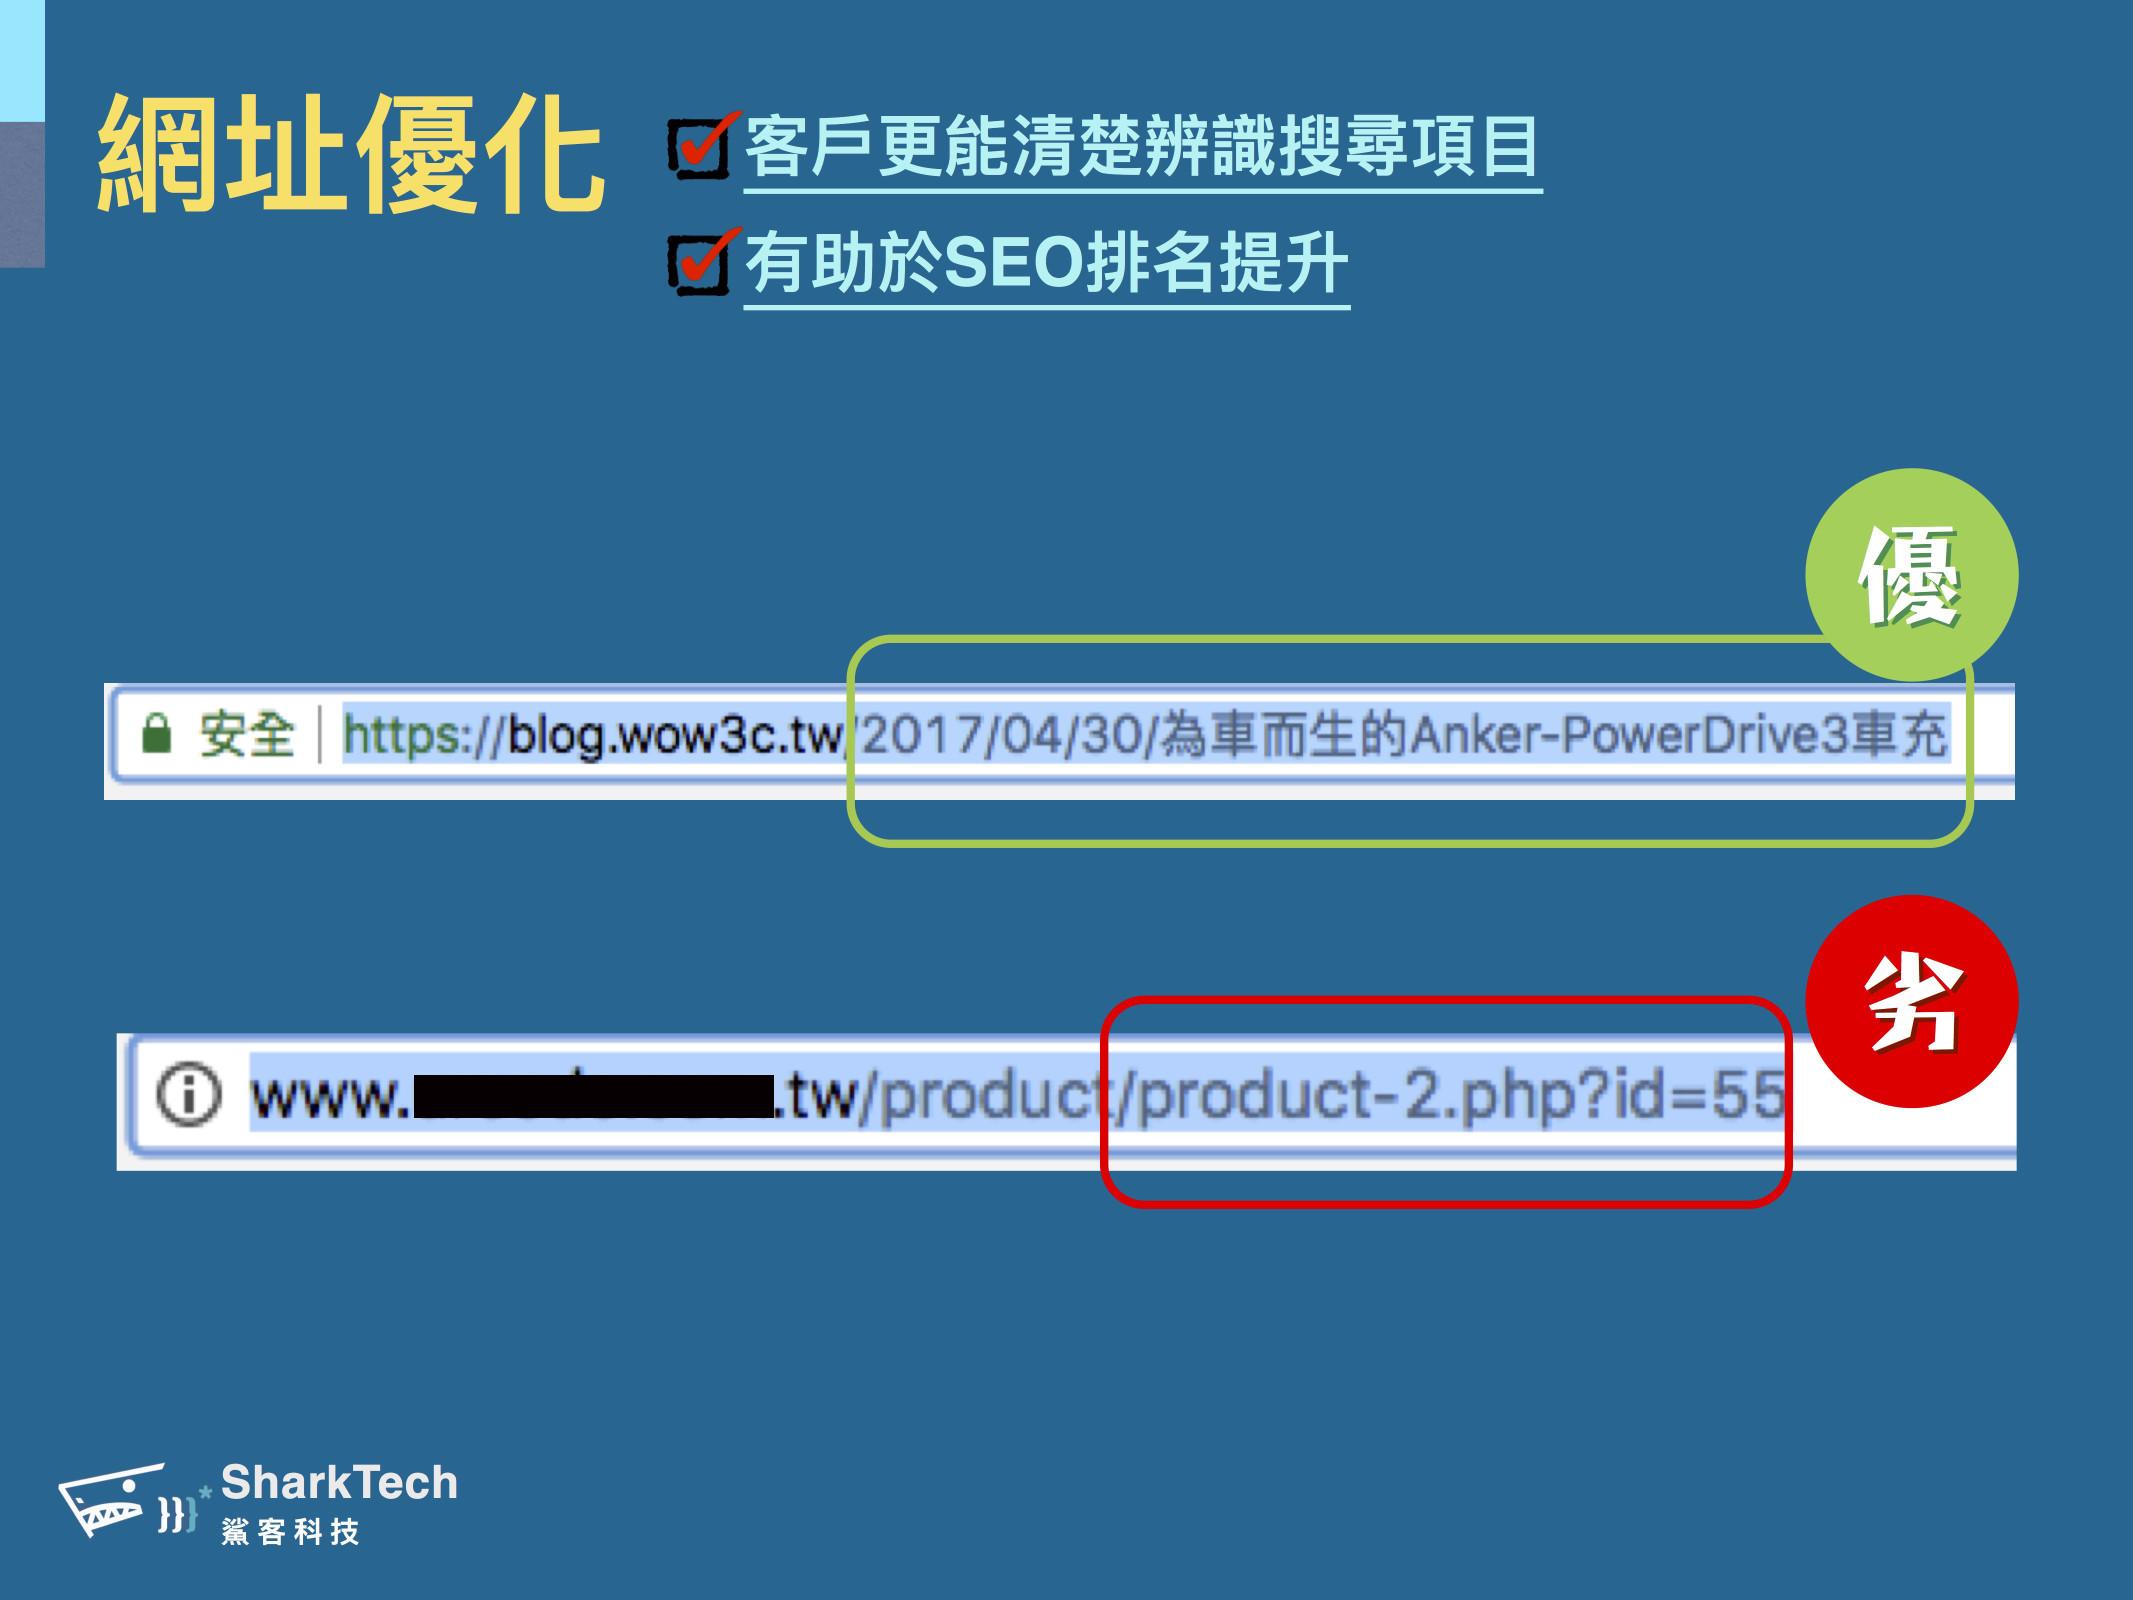 URL網址優化範例-鯊客科技